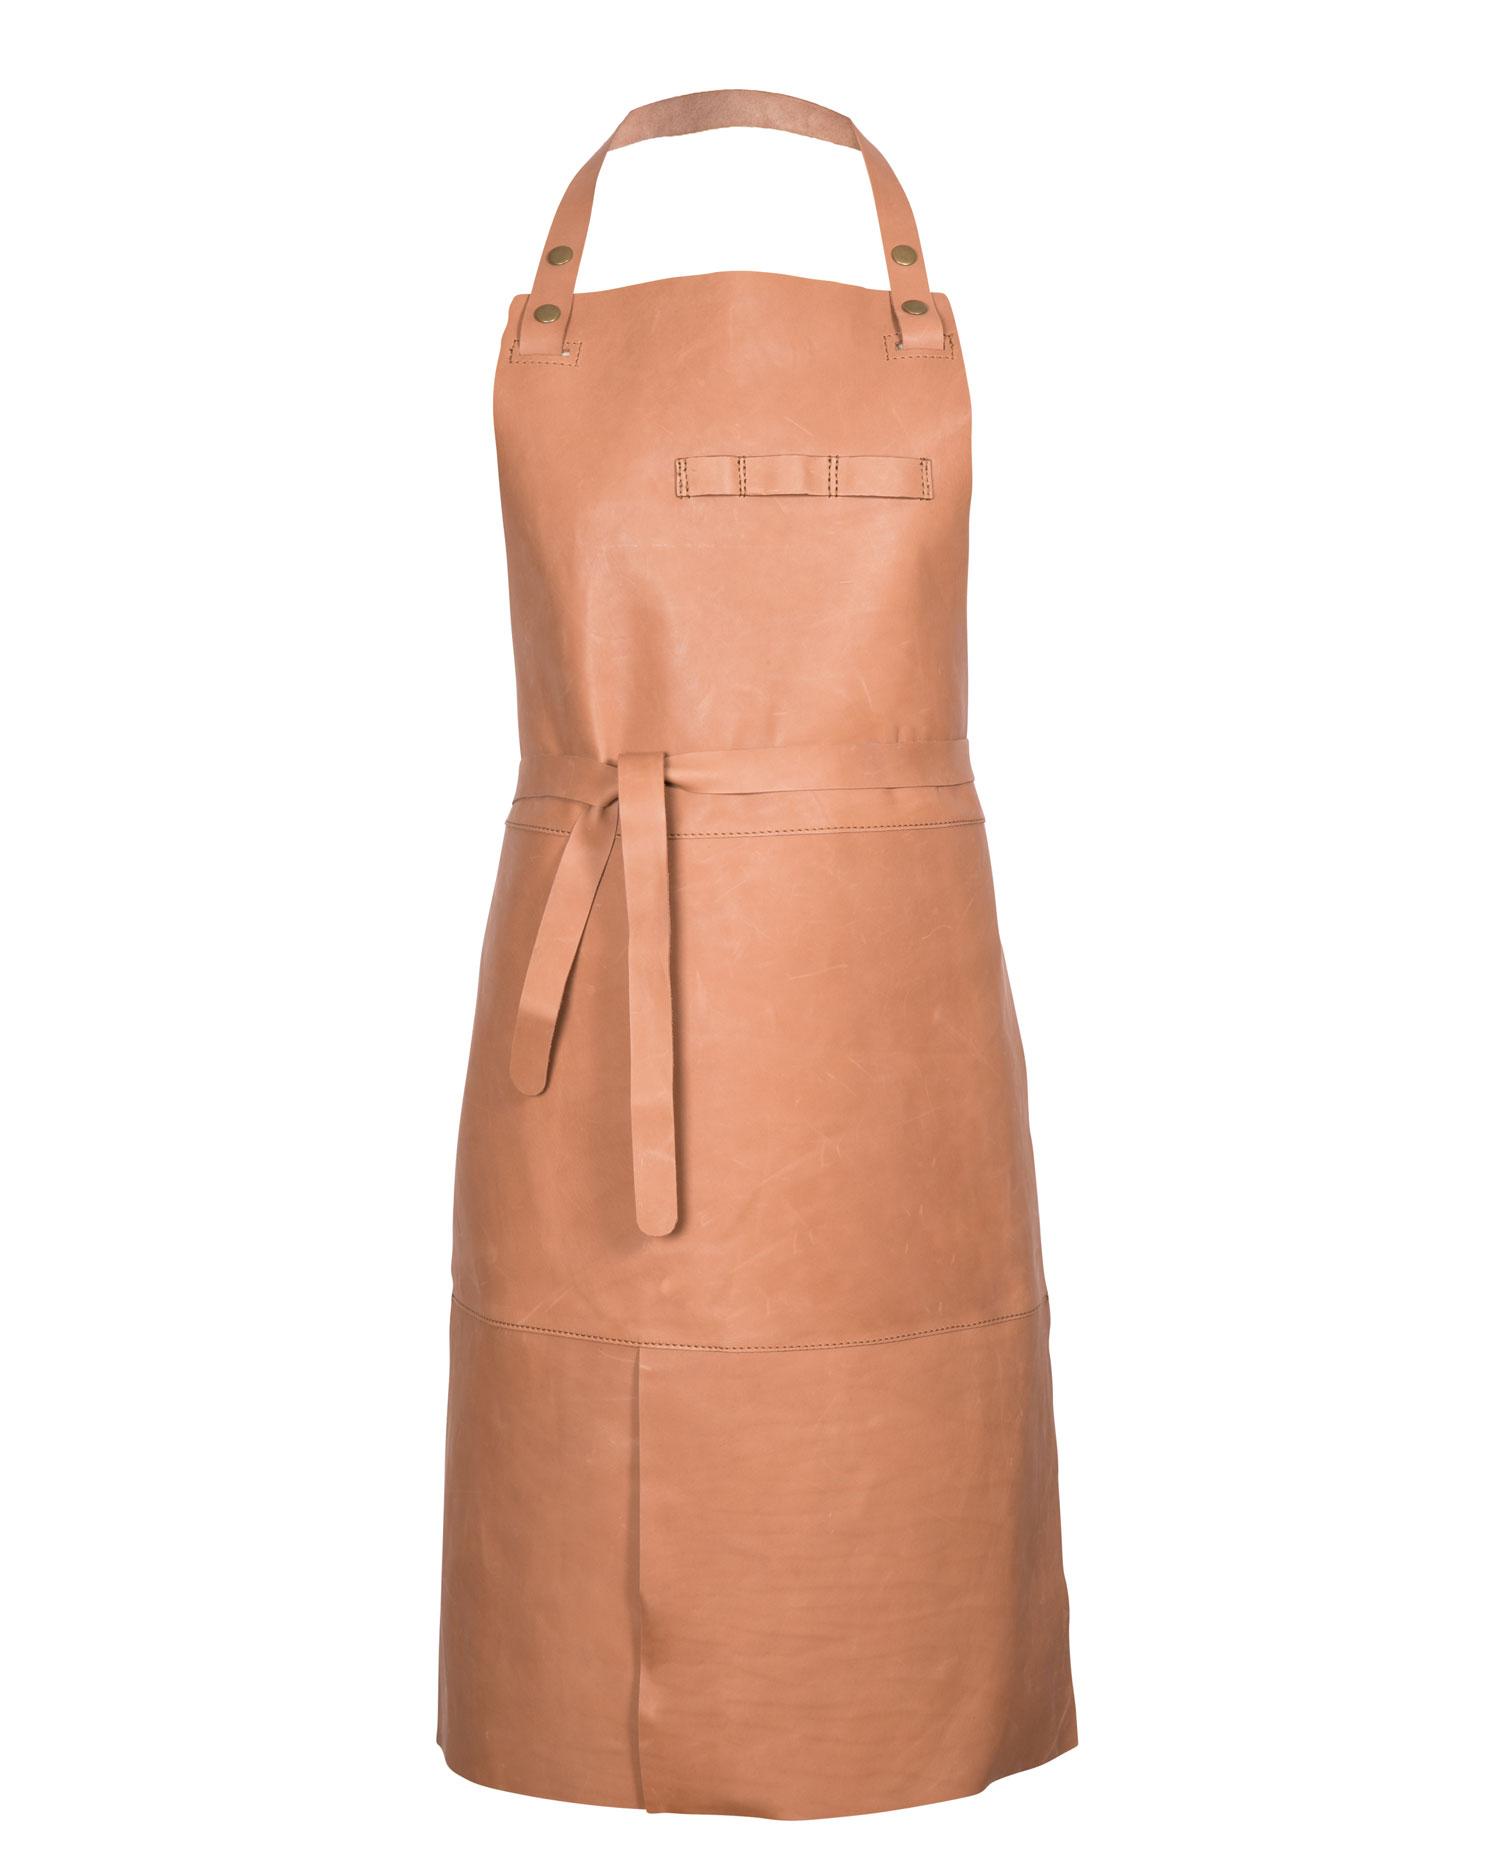 Tina apron cow leather nature